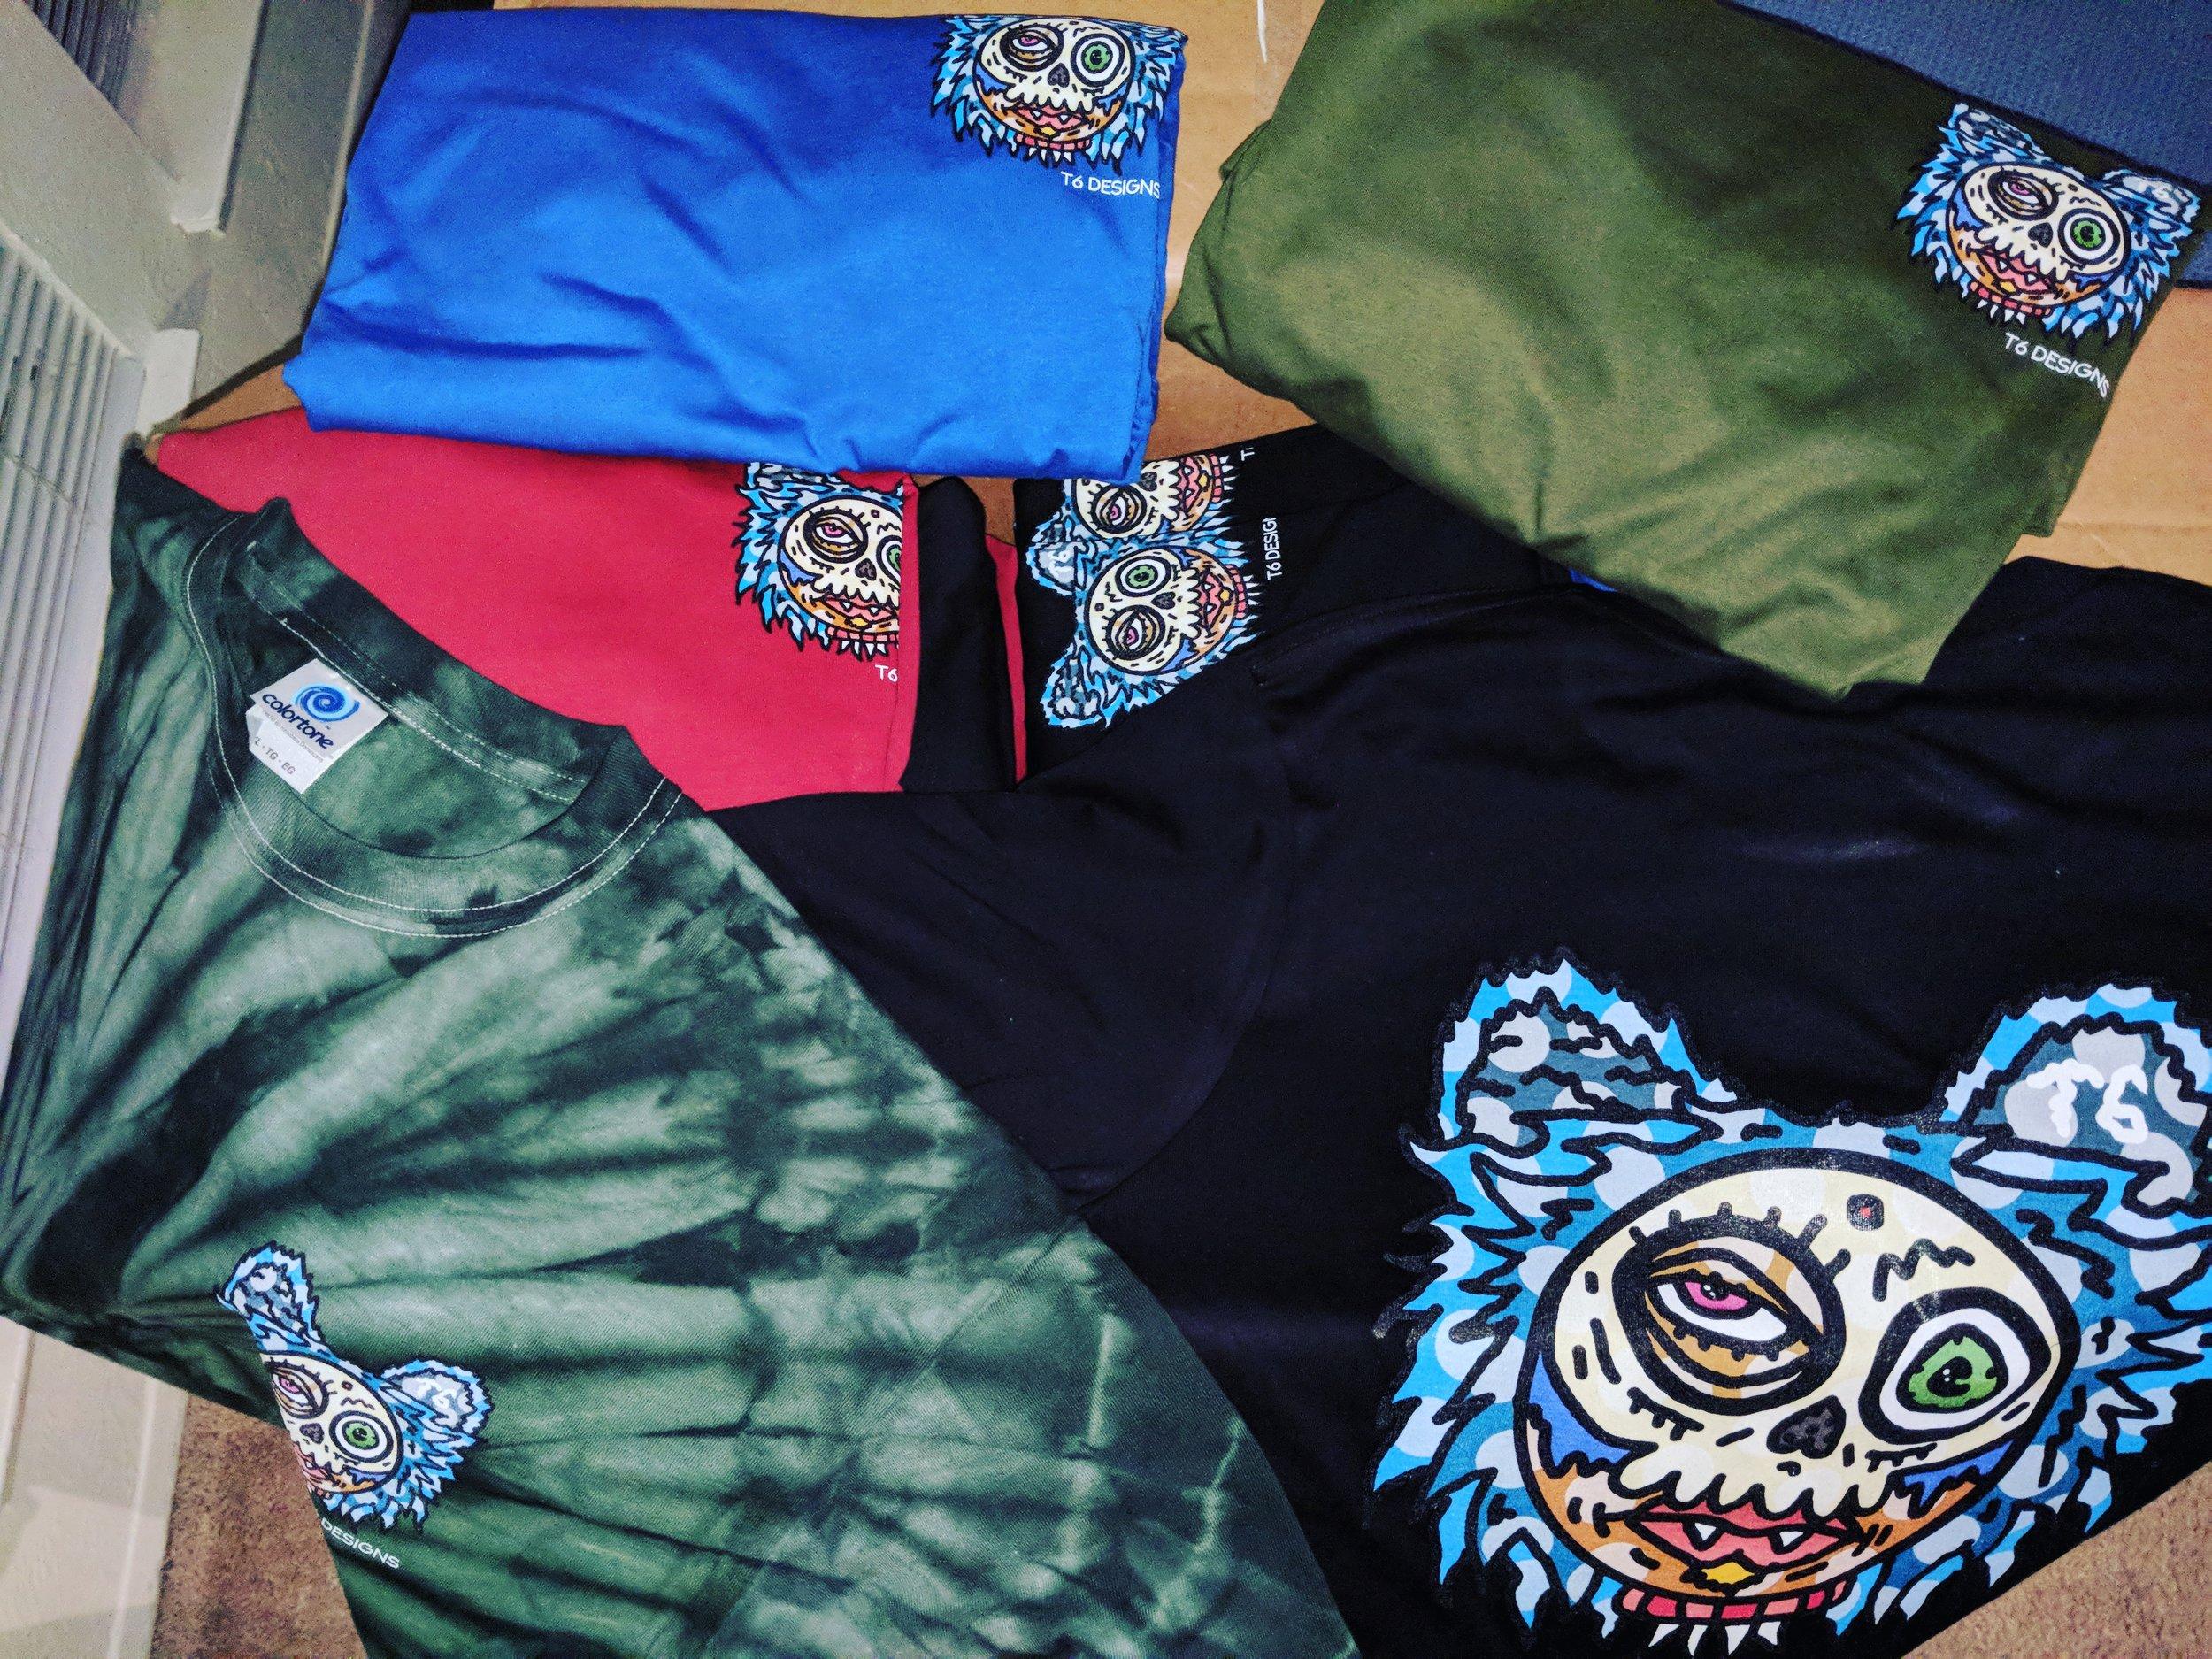 Shirt Shipment: Fuzzy T6 Long/Short Sleeve